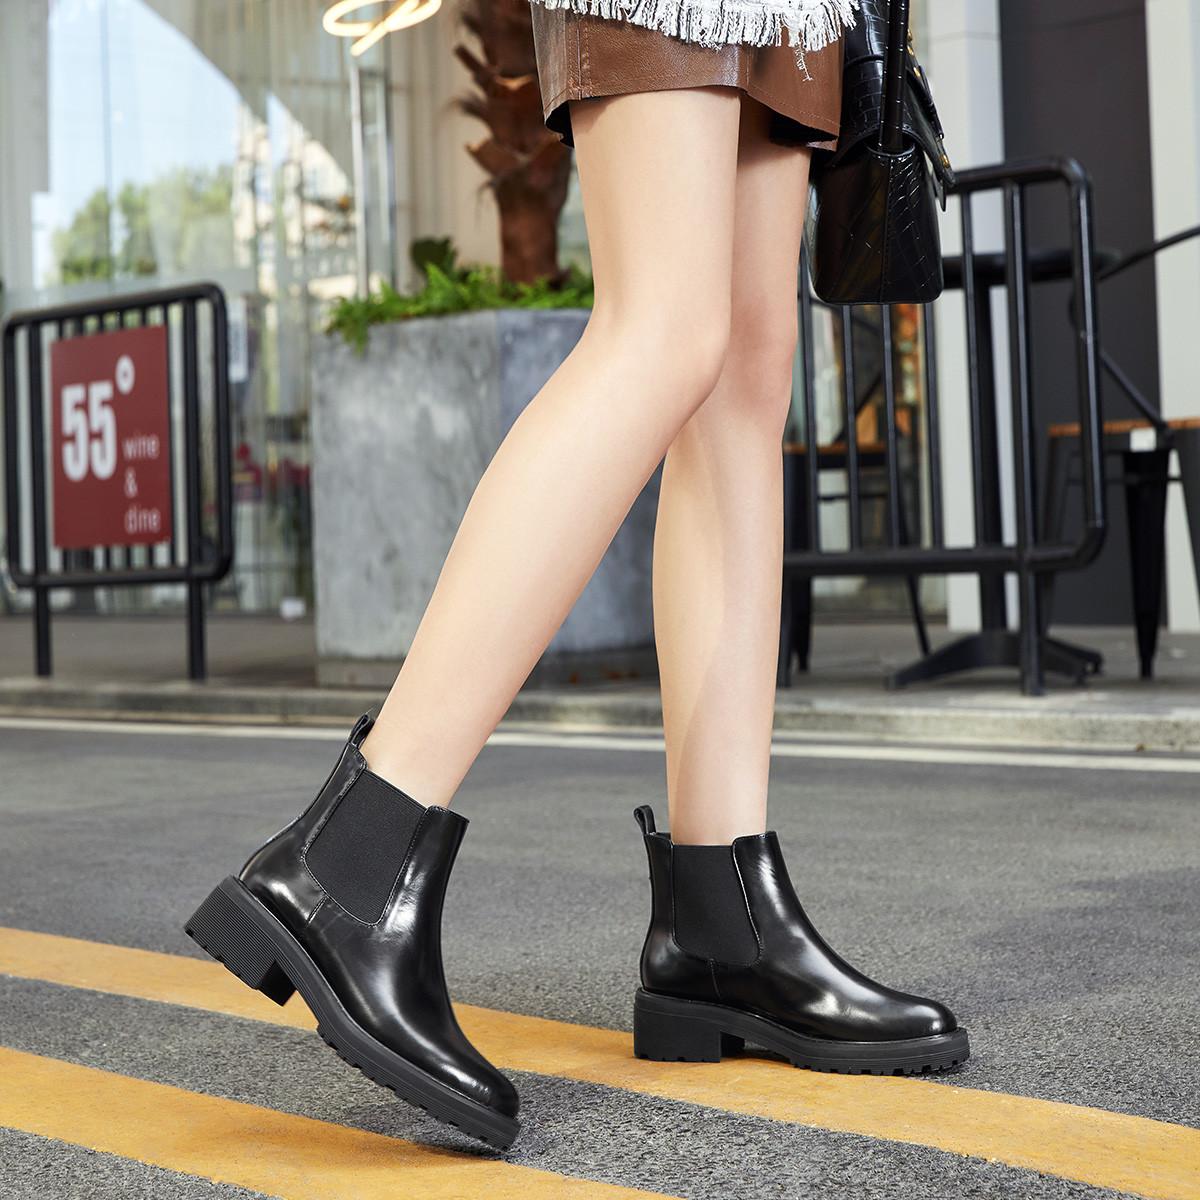 JANE HARLOW杰雷哈洛女靴2019冬新款牛皮质感切尔西靴方跟套脚女靴J14FF00680PA001